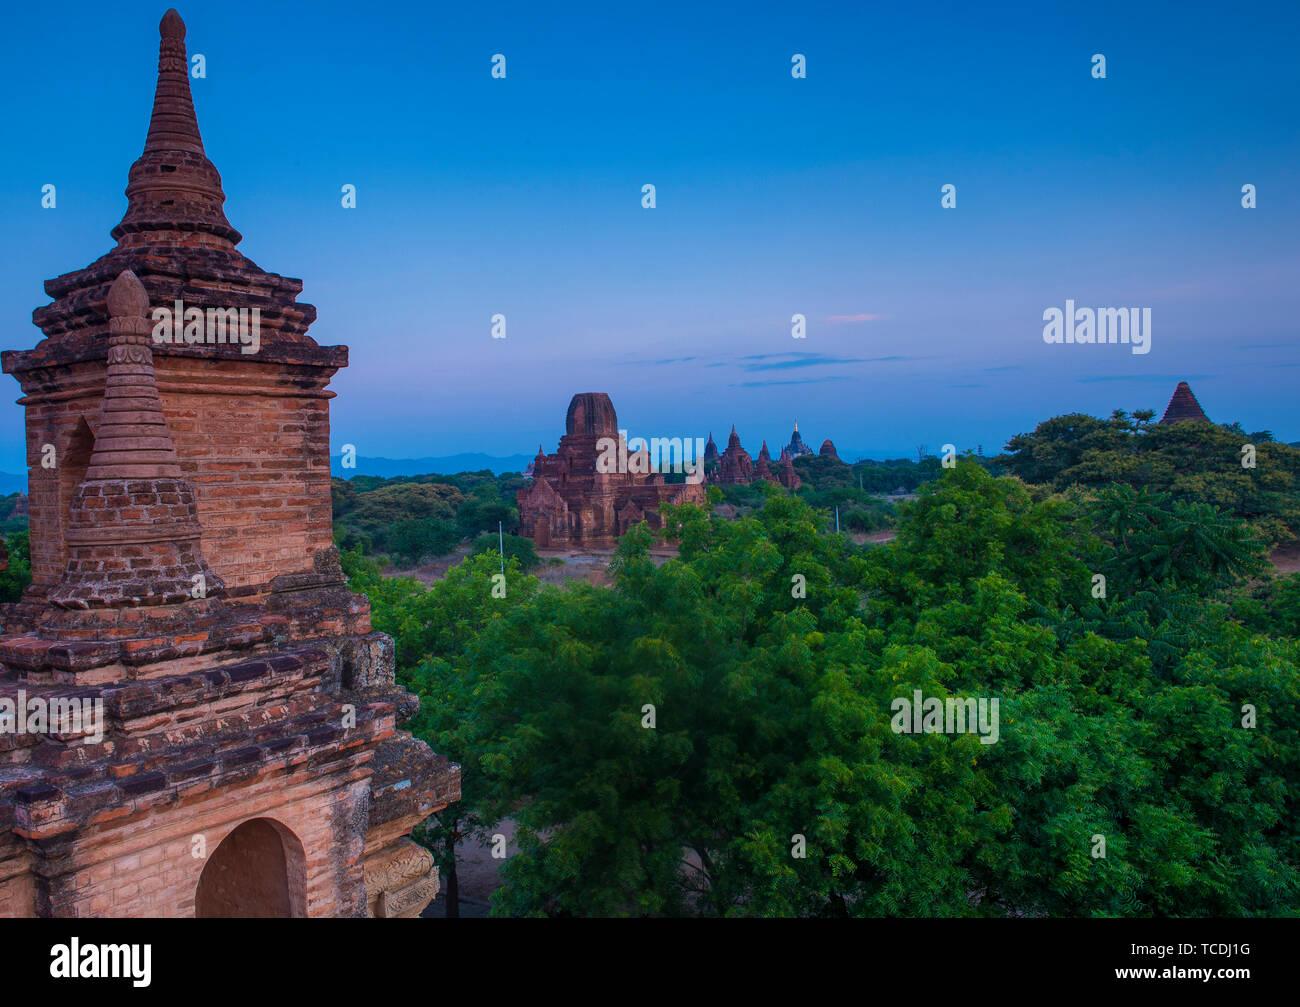 The Temples of bagan in Myanmar. Stock Photo